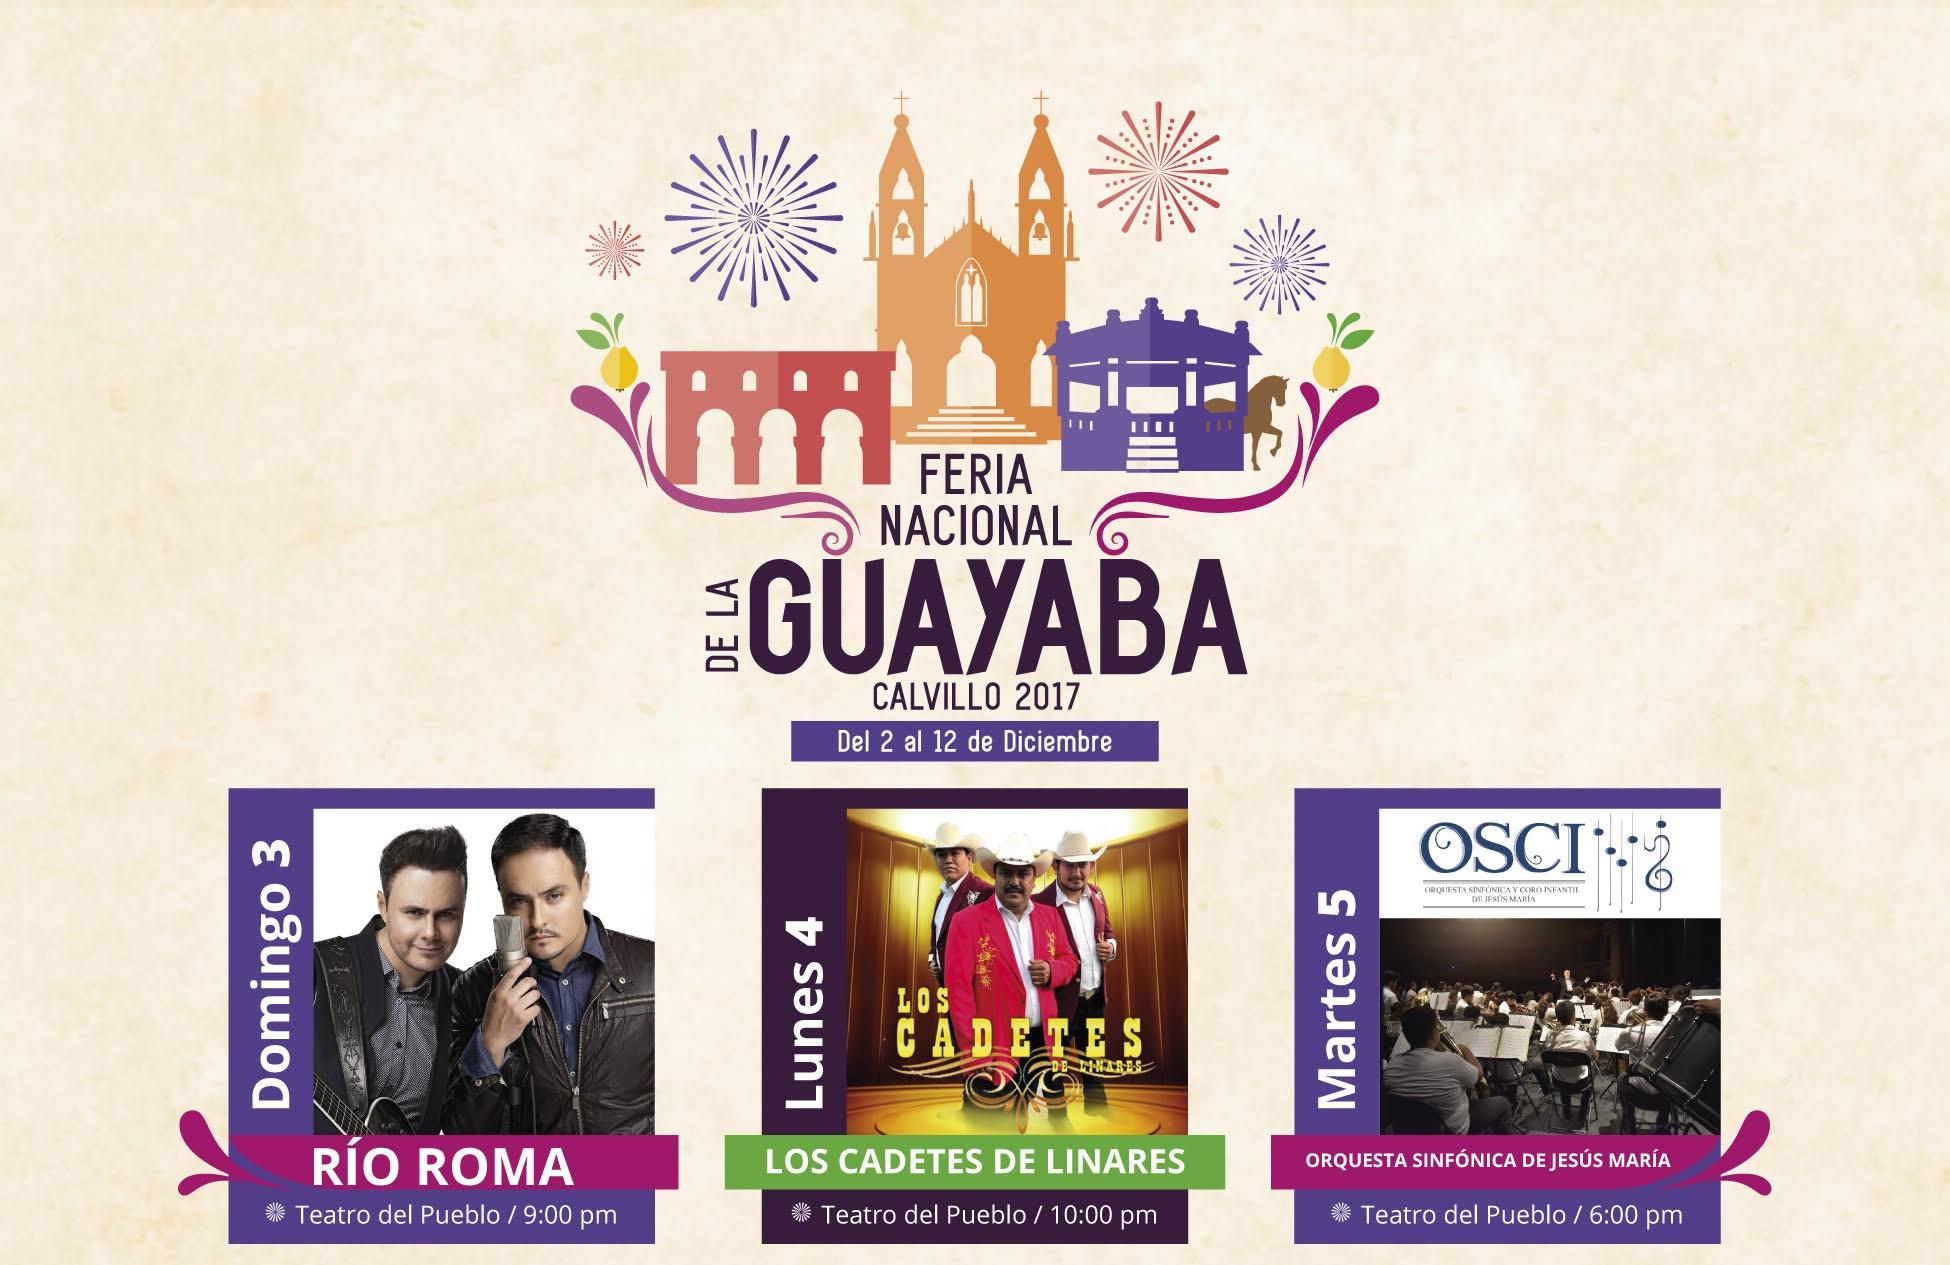 Feria Nacional de la Guayaba dejó una derrama de 10 millones de pesos